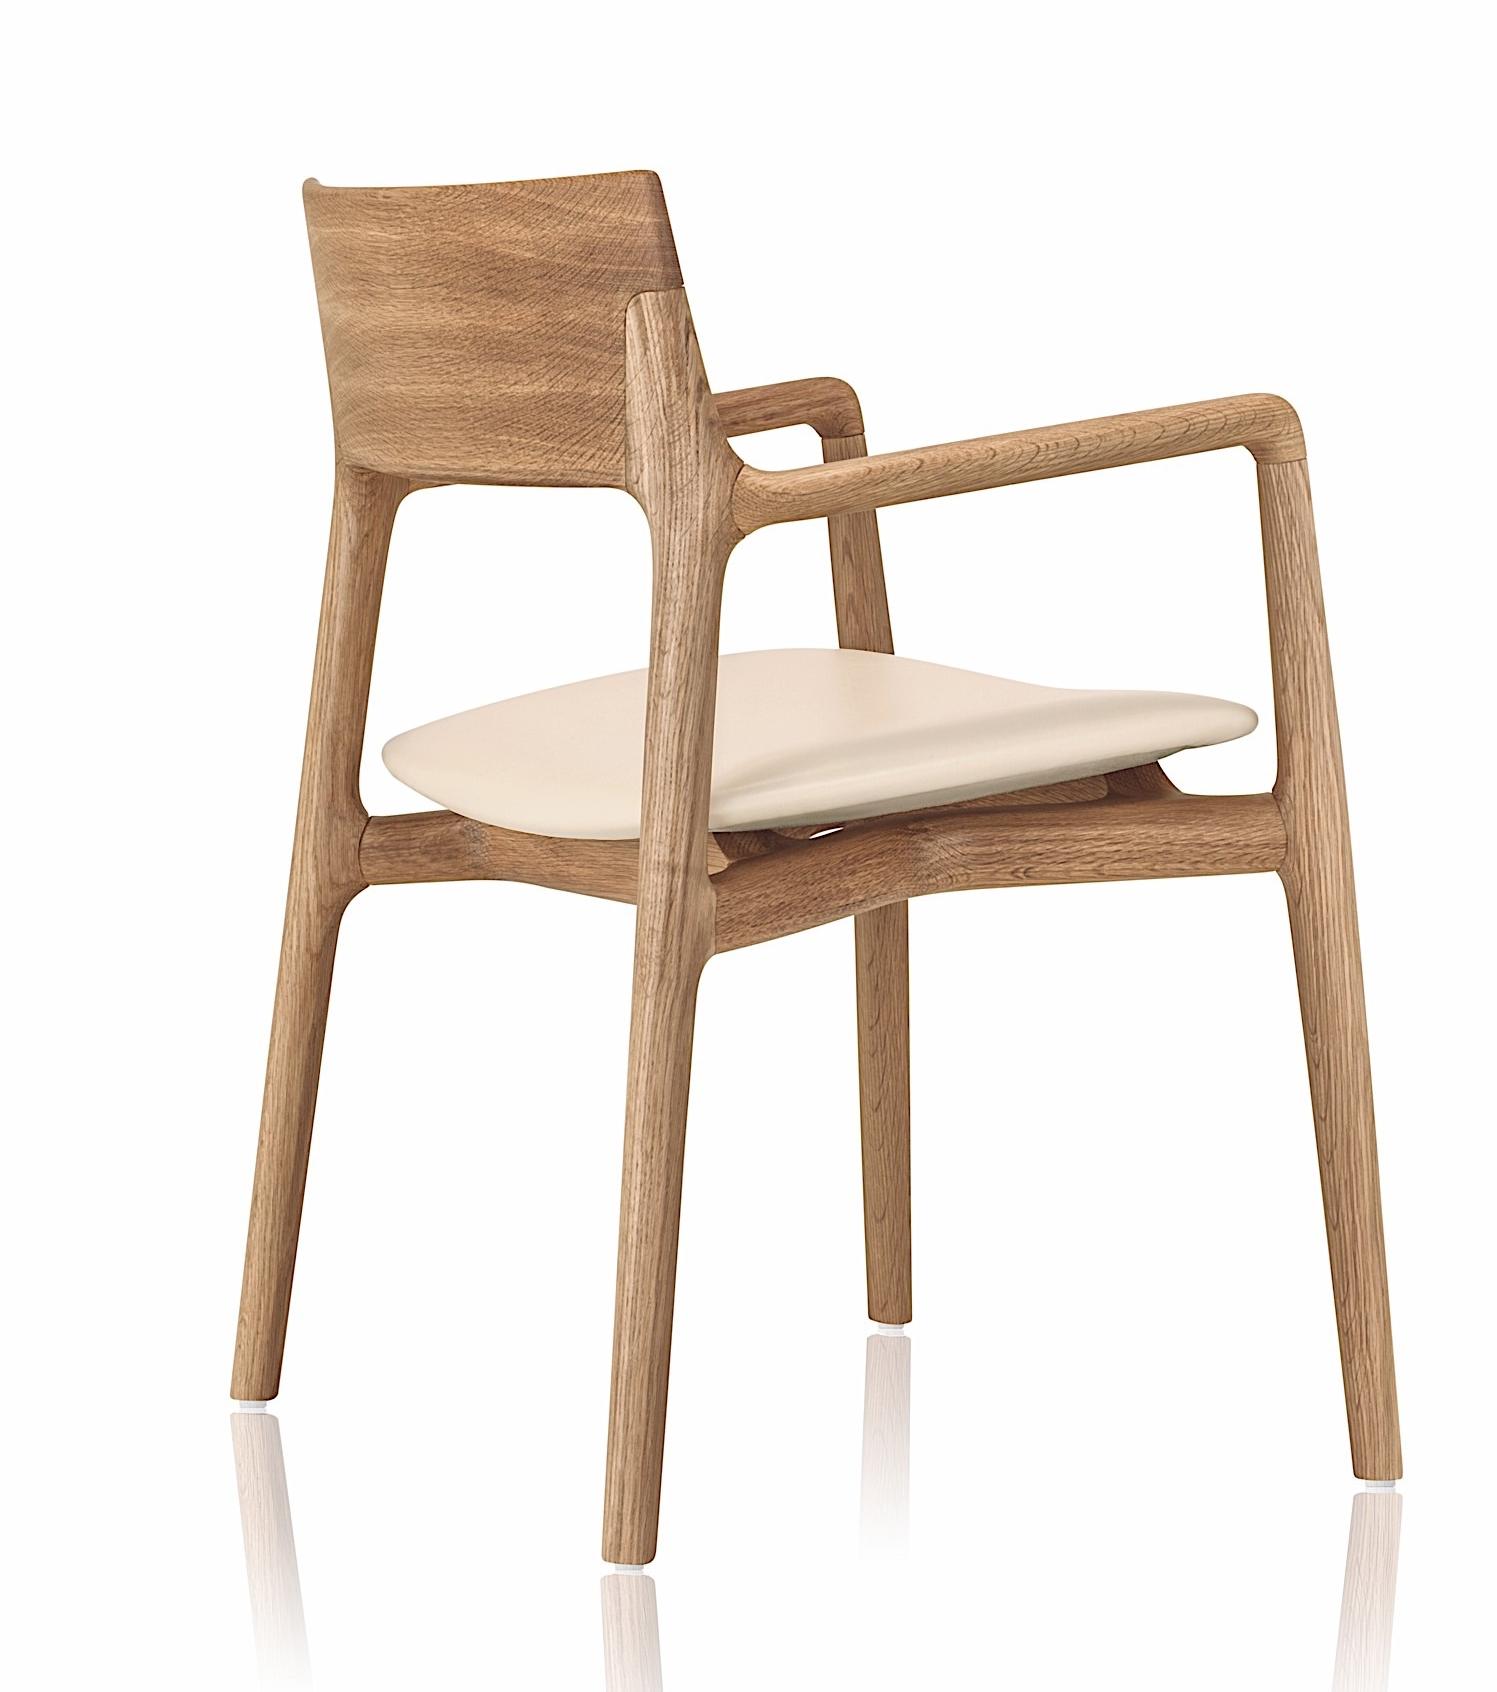 SJ_armchair_norma_01.jpg